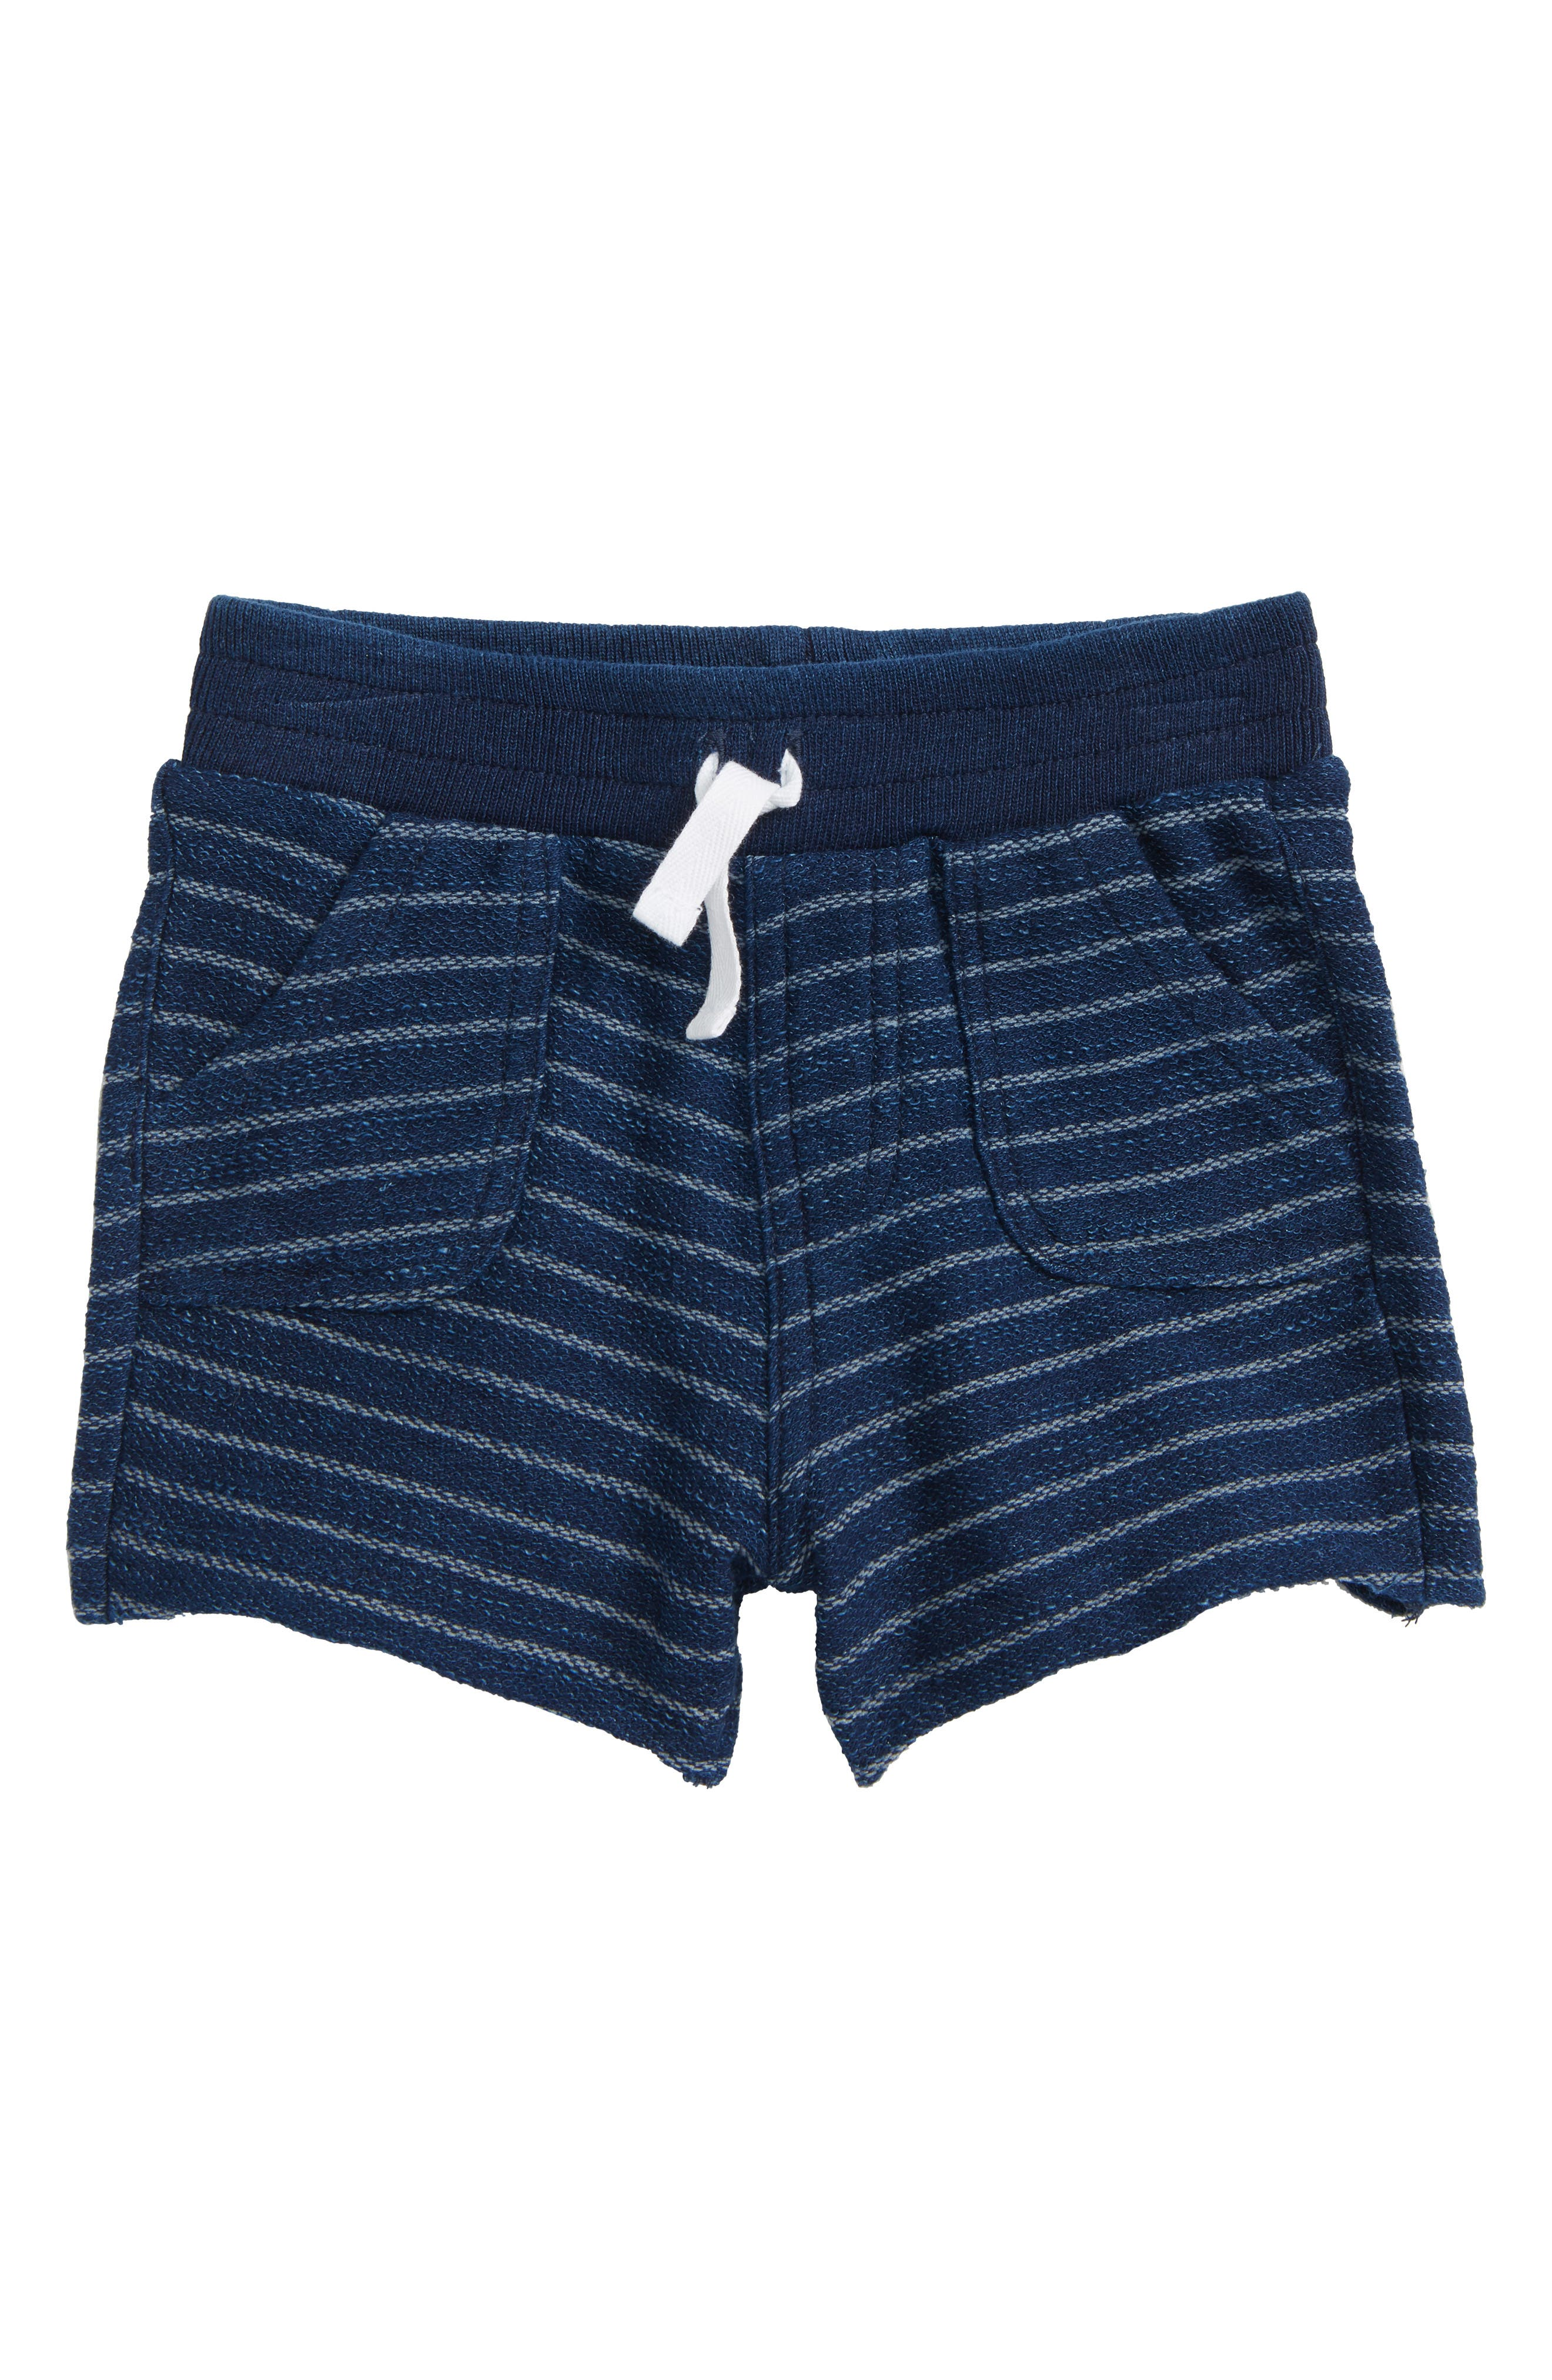 Indigo Stripe French Terry Shorts,                         Main,                         color, Dark Stone/ Indigo